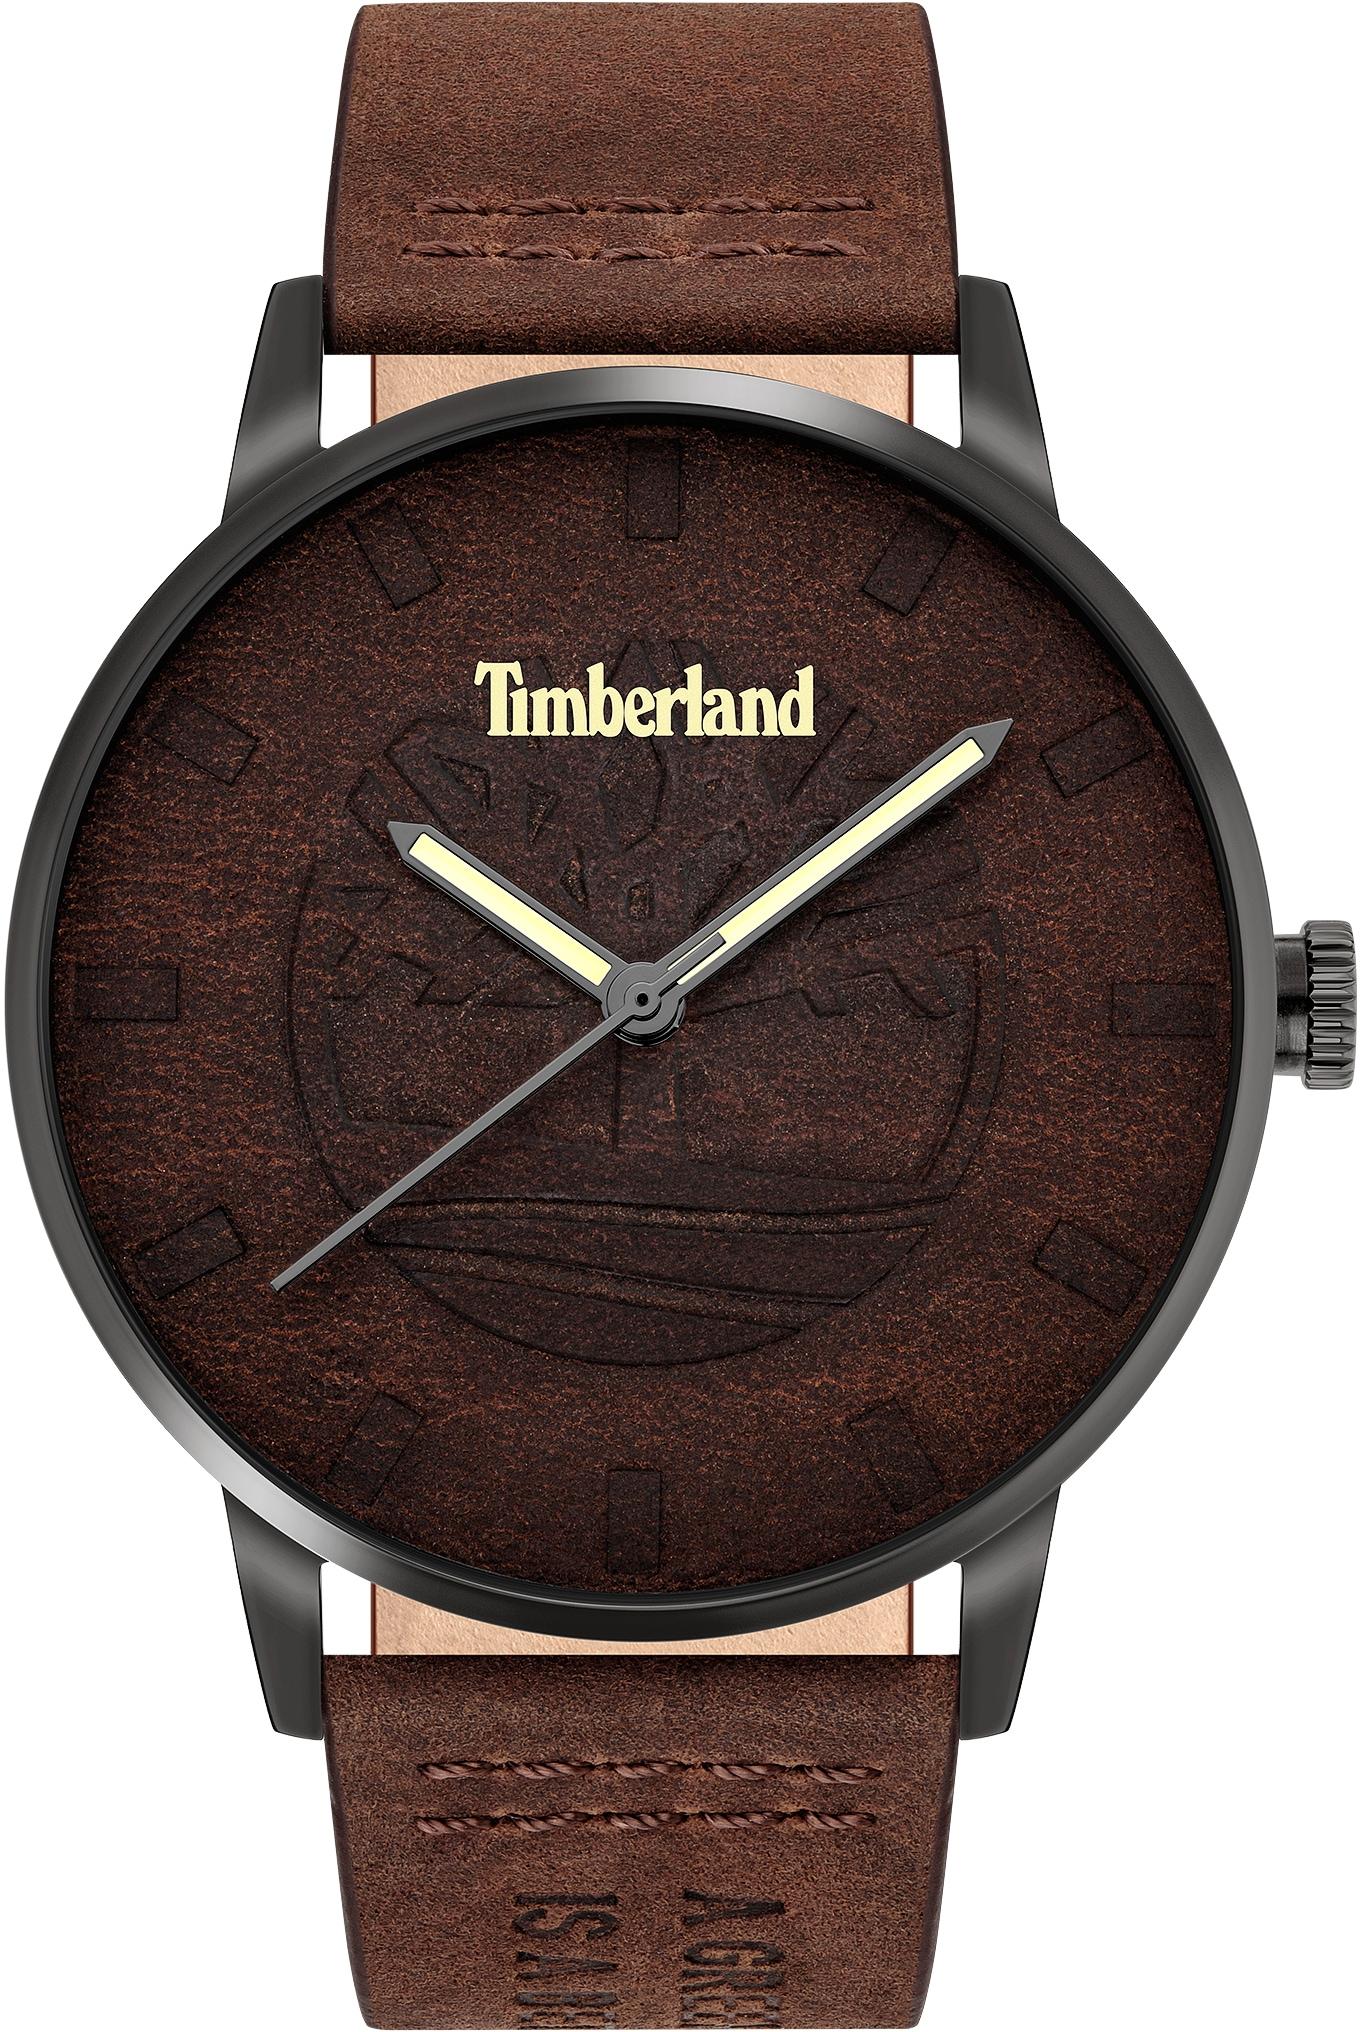 timberland -  Quarzuhr RAYCROFT, TDWJA2000803